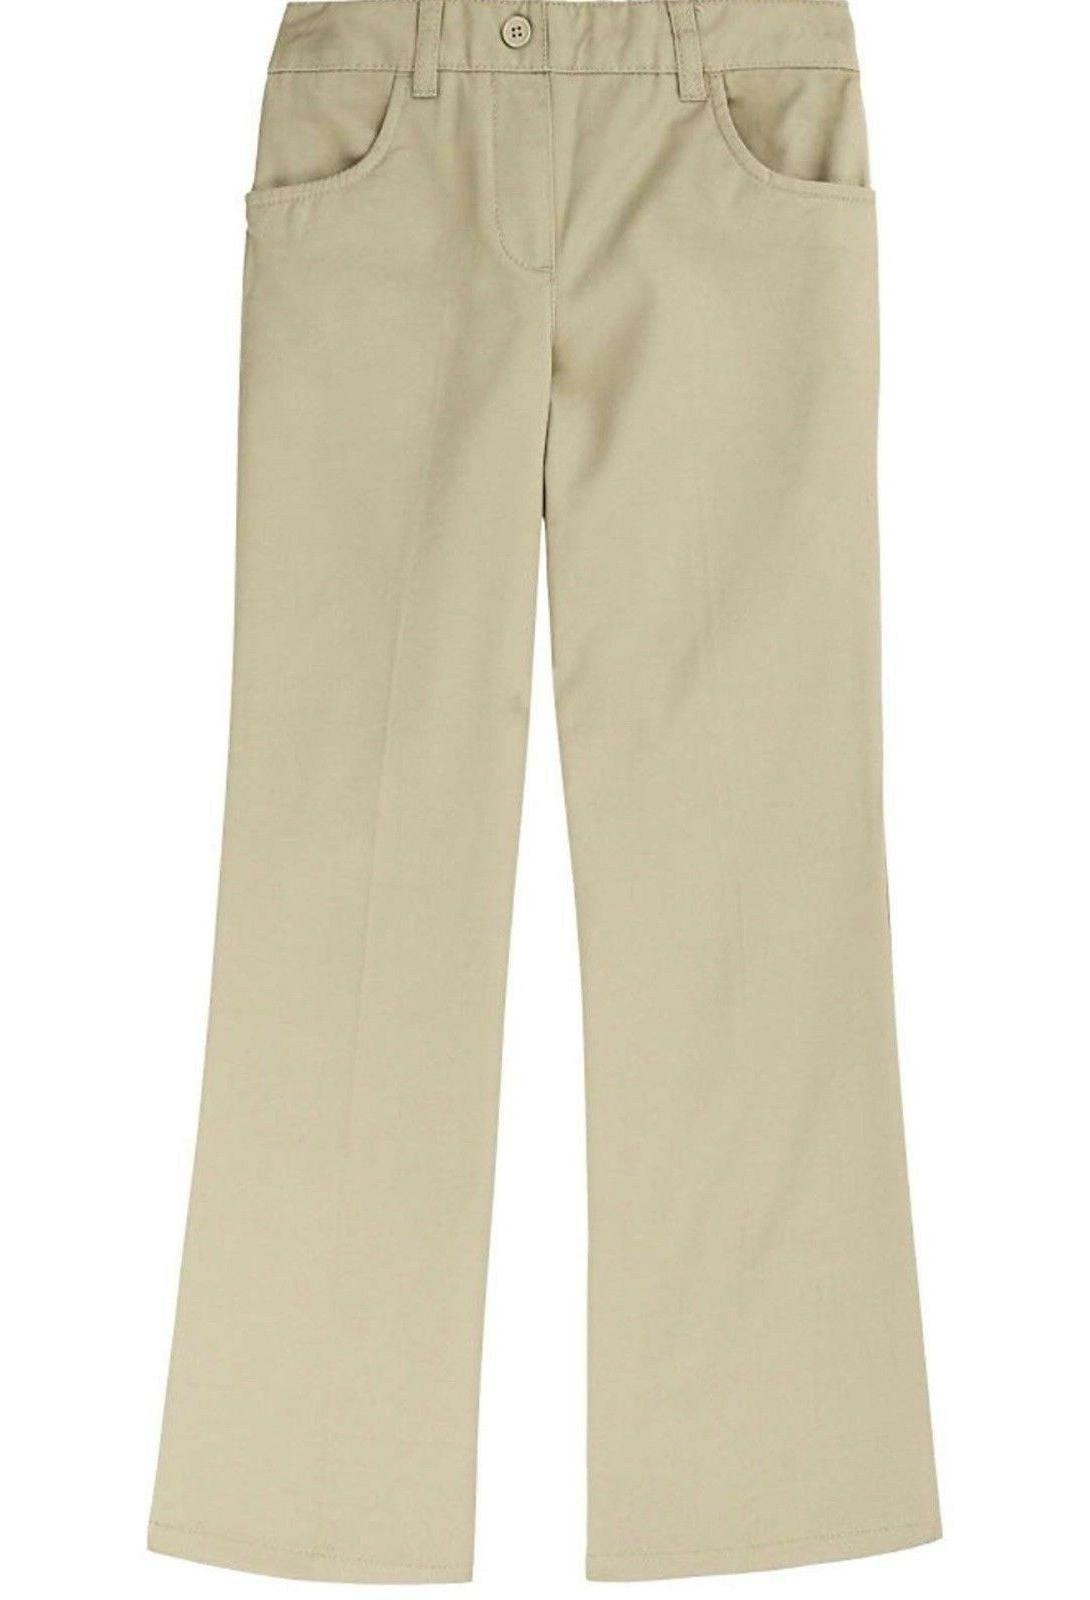 nwt girls pull on uniform khaki pants